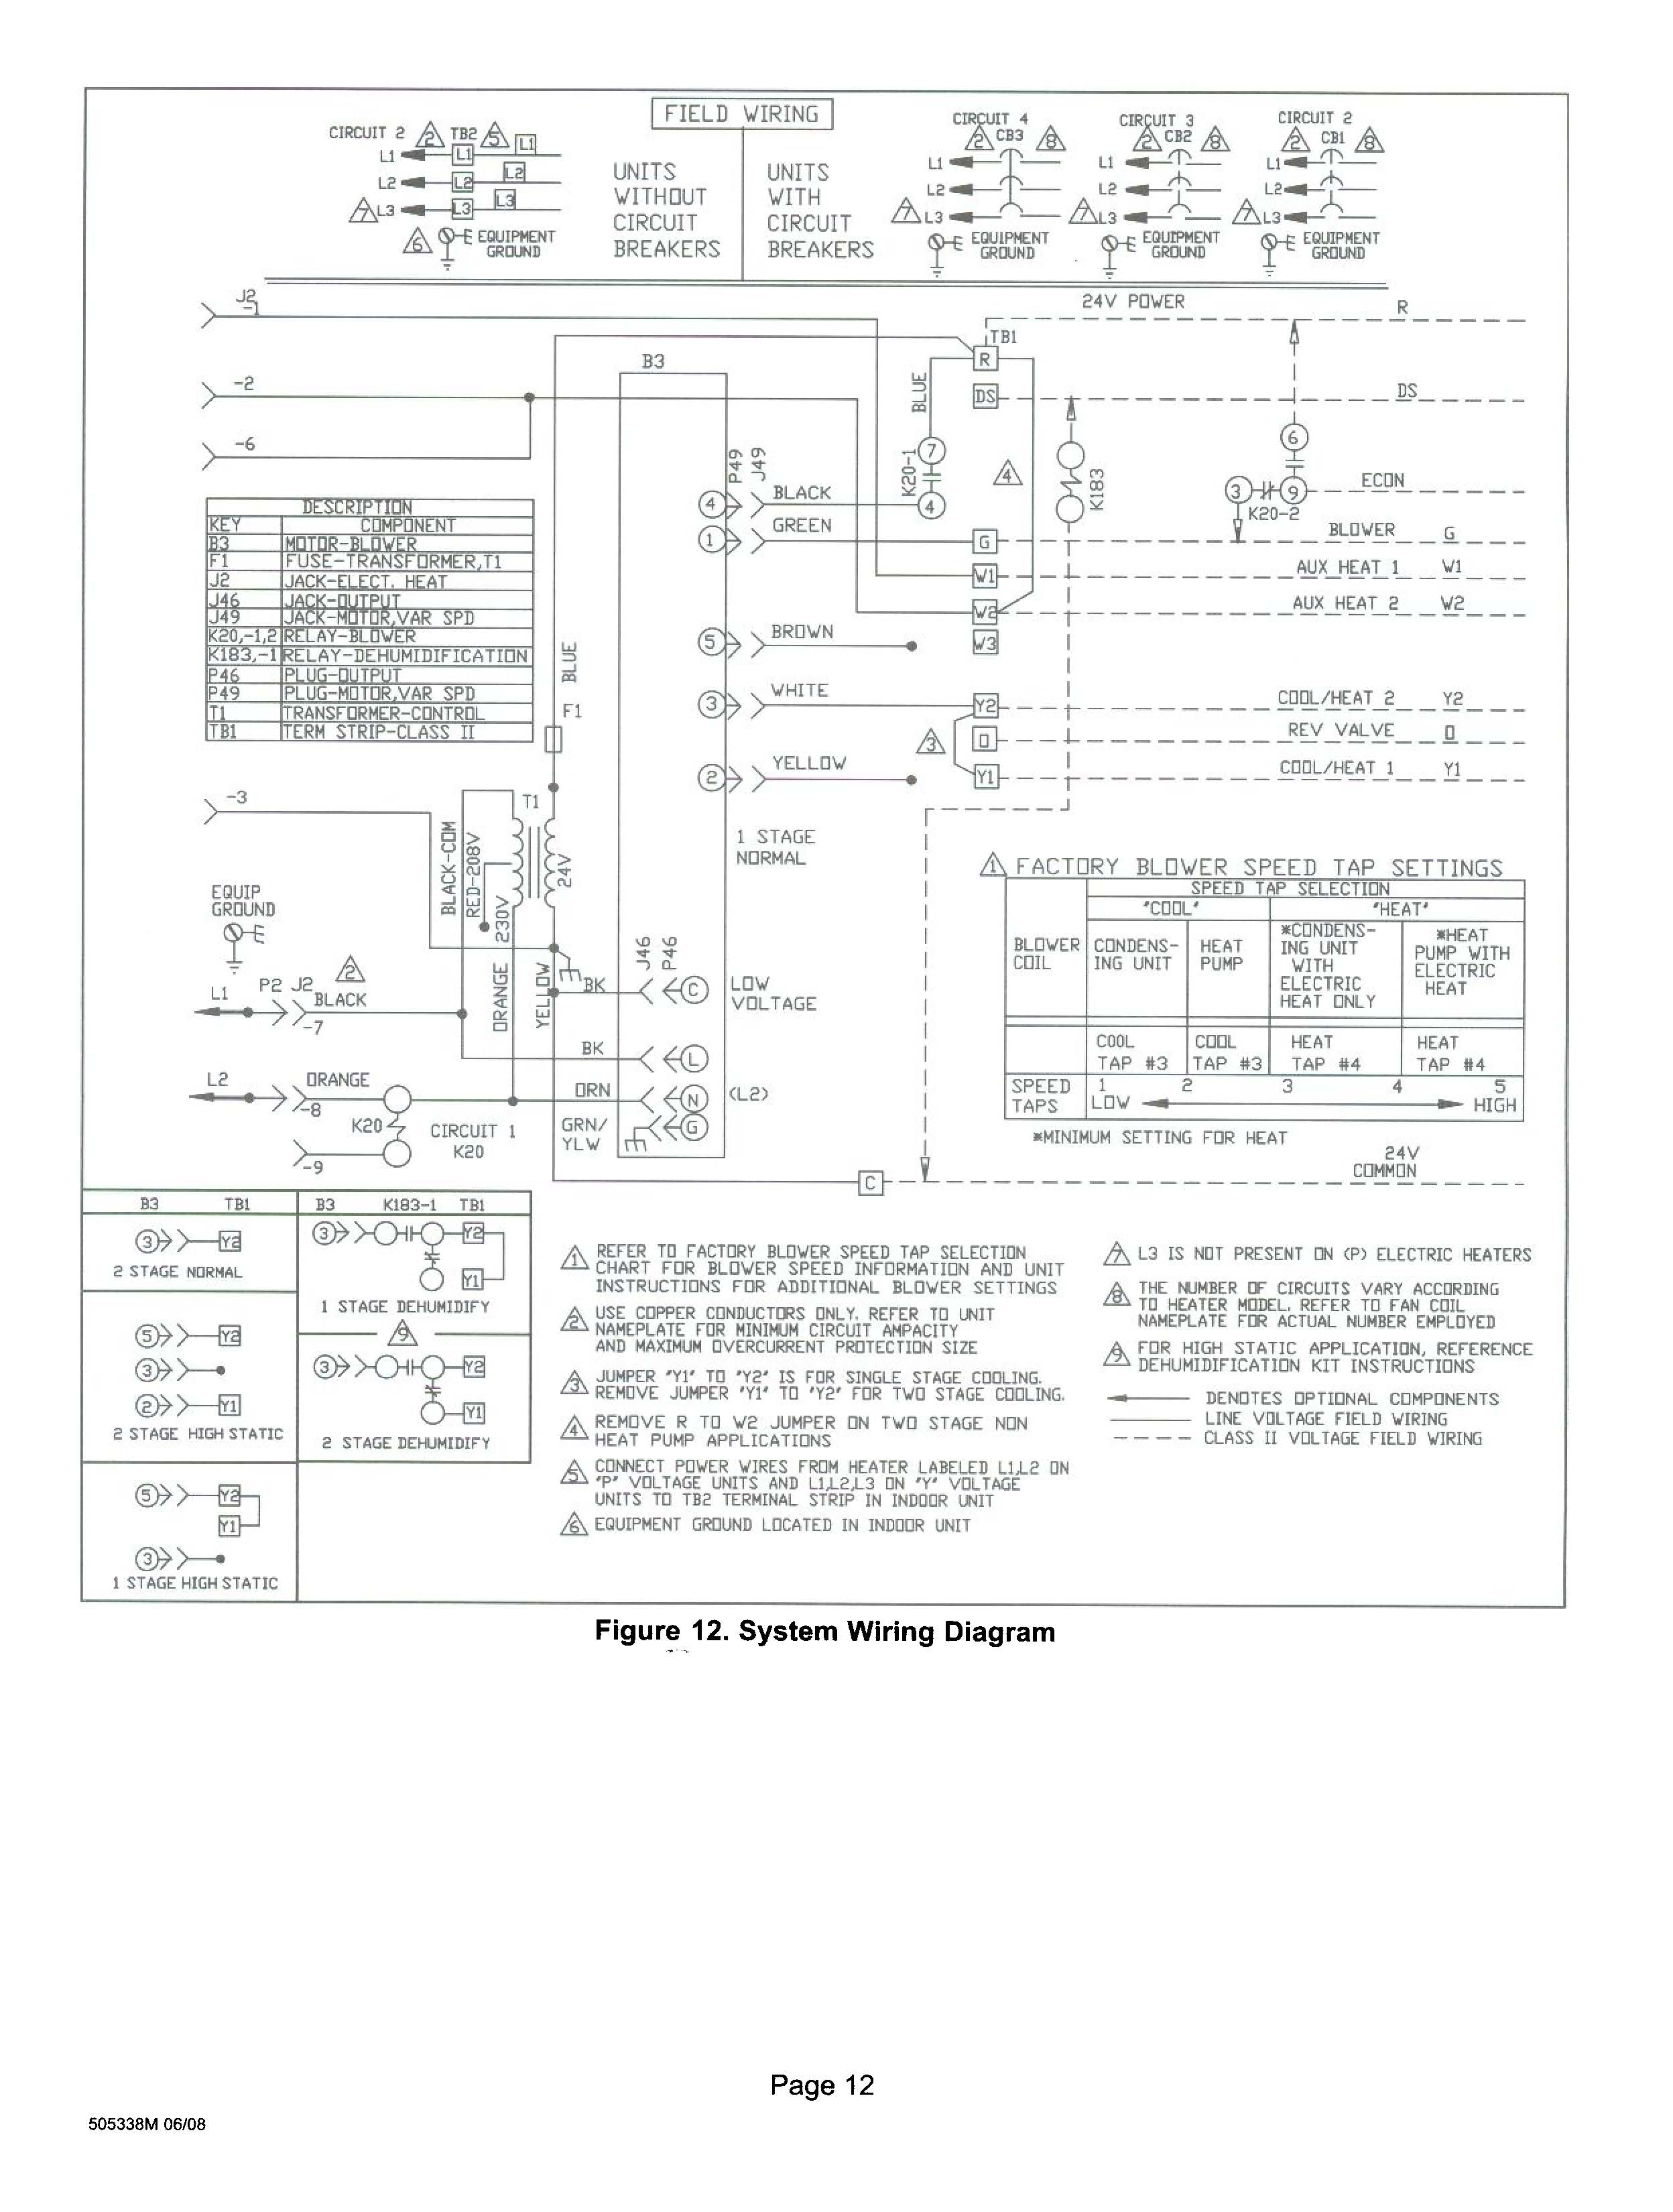 wiring diagram lennox hvac the wiring diagram lennox wiring schematic nilza wiring diagram